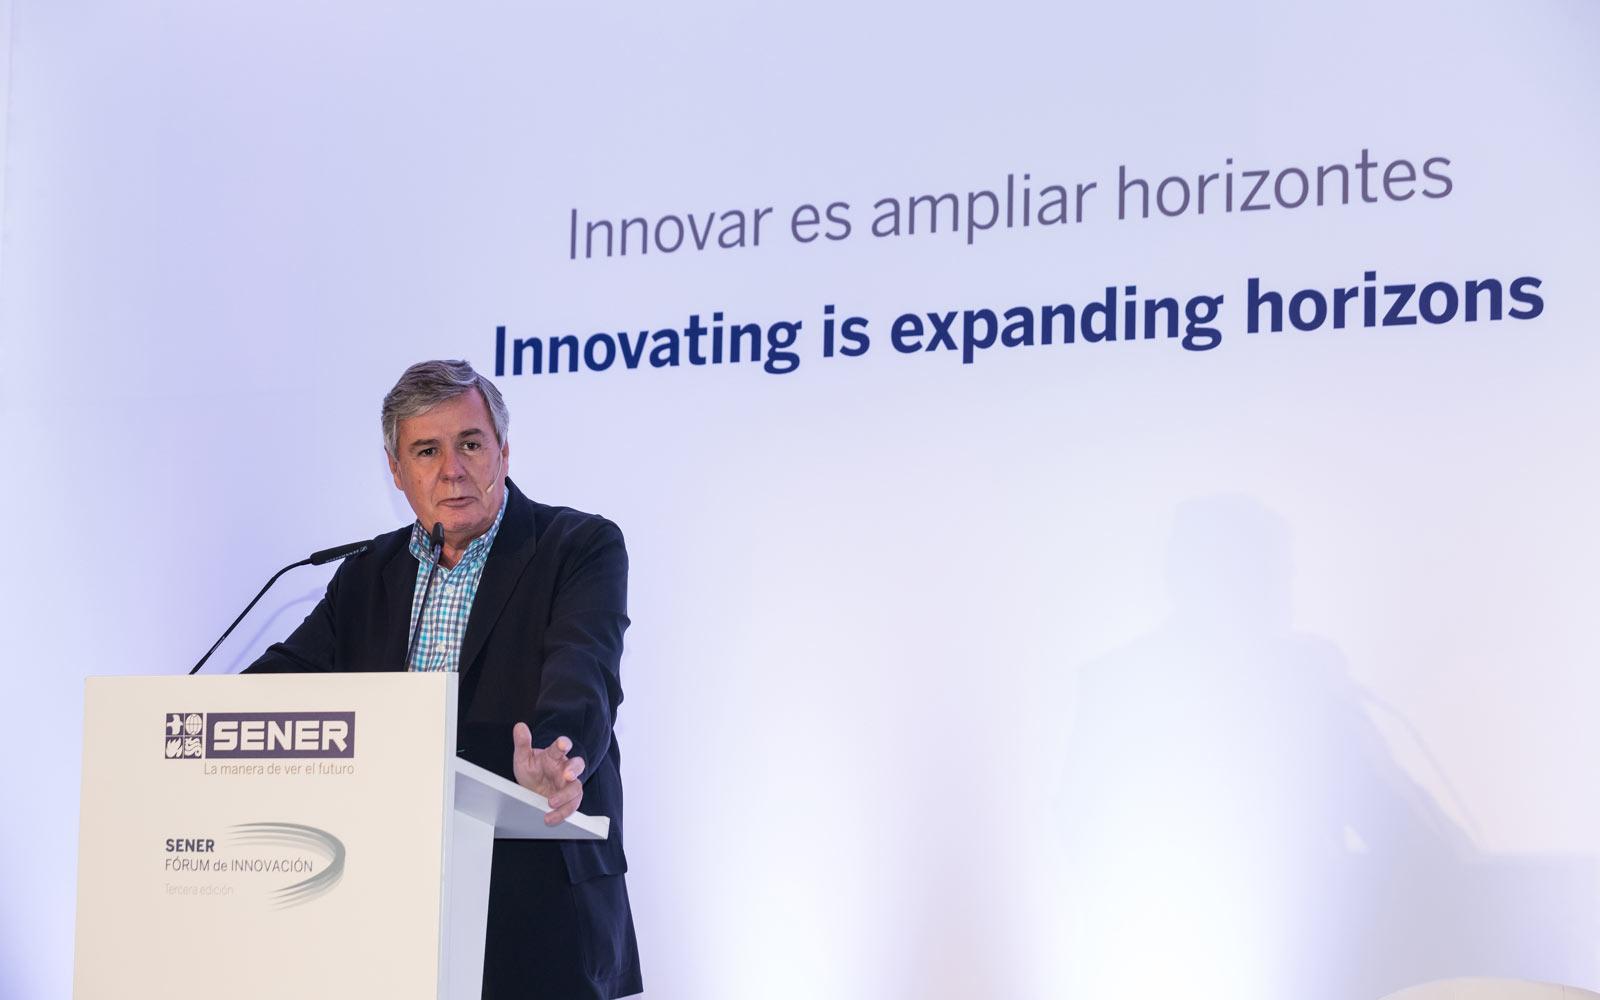 http://www.ingenieriayconstruccion.sener/ecm-images/3-Forum-a-la-innovacin